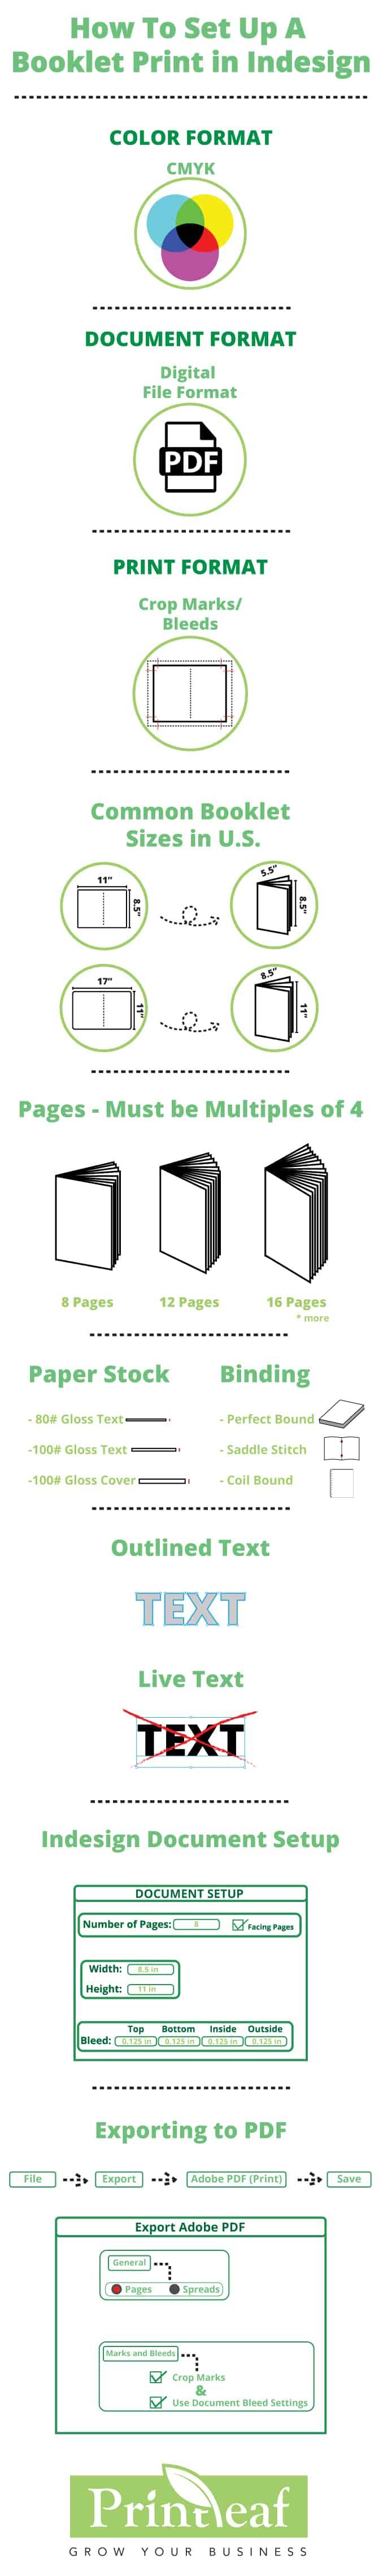 InDesign-Booklet-Printing-Infographic by Printleaf